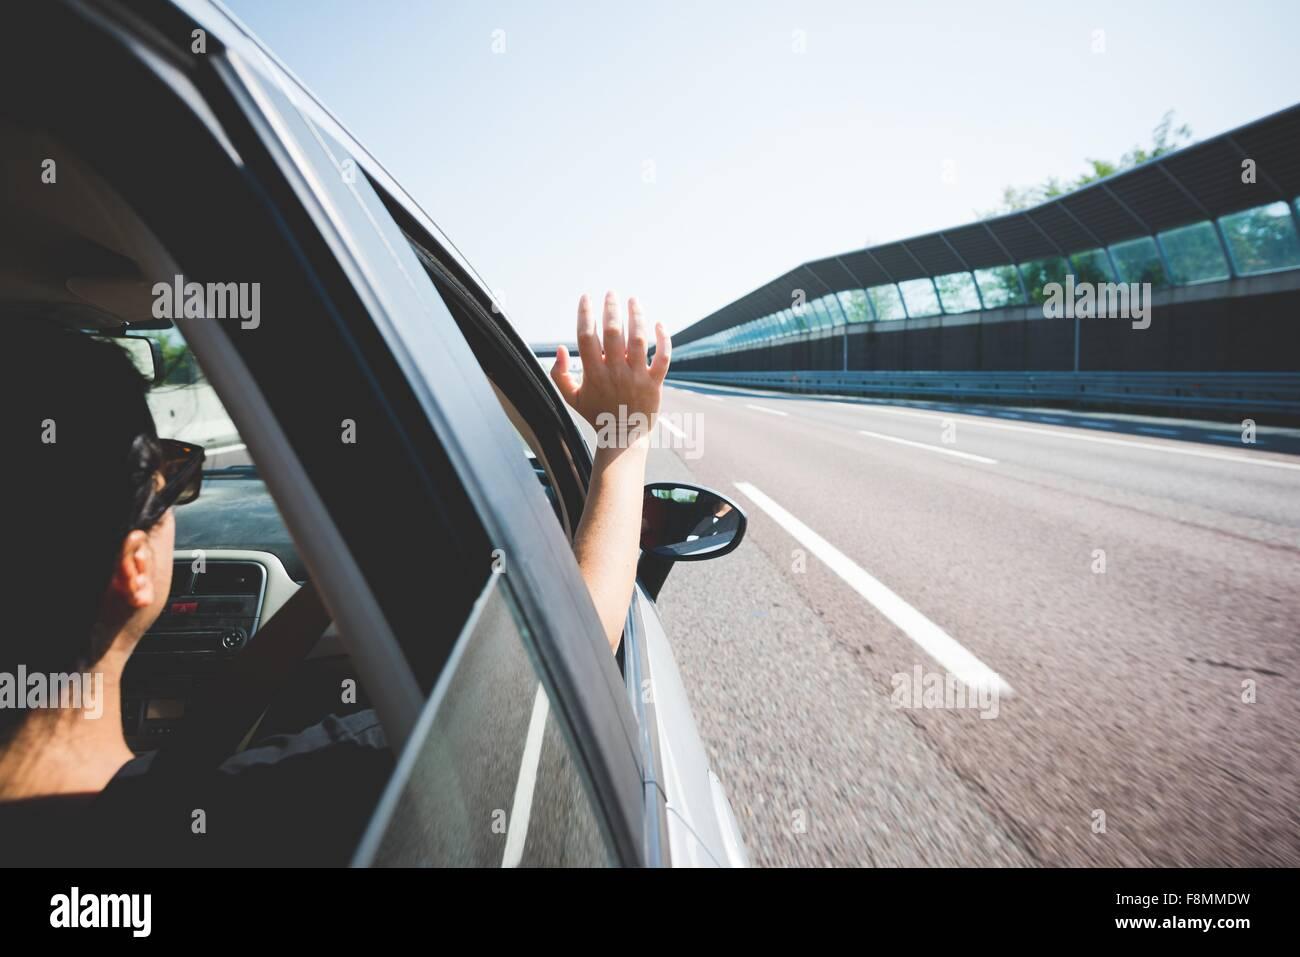 Femme voyageant sur l'autoroute, Garda, Italie Photo Stock